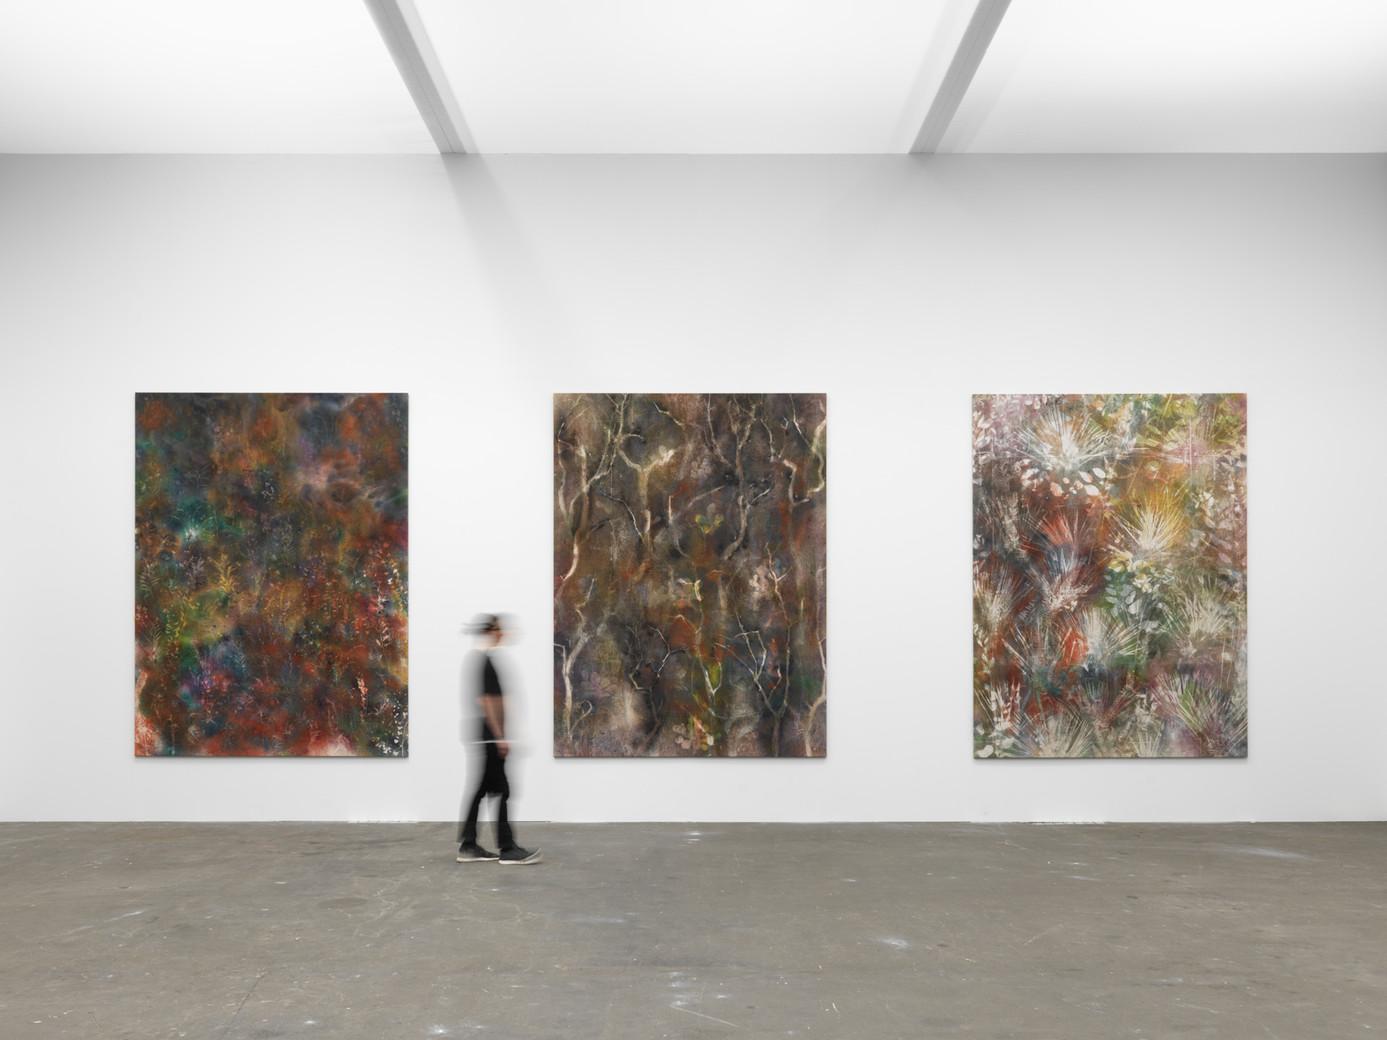 Sam Falls / 303 Gallery